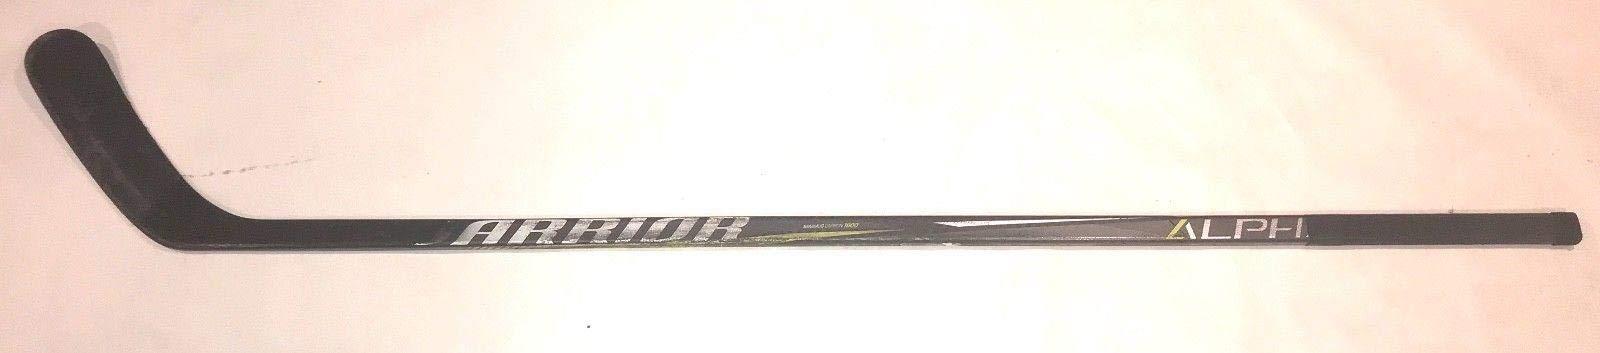 Thomas Vanek Game Used Stick DETROIT RED WINGS 2018 2019 Warrior Alpha Game Used NHL Sticks